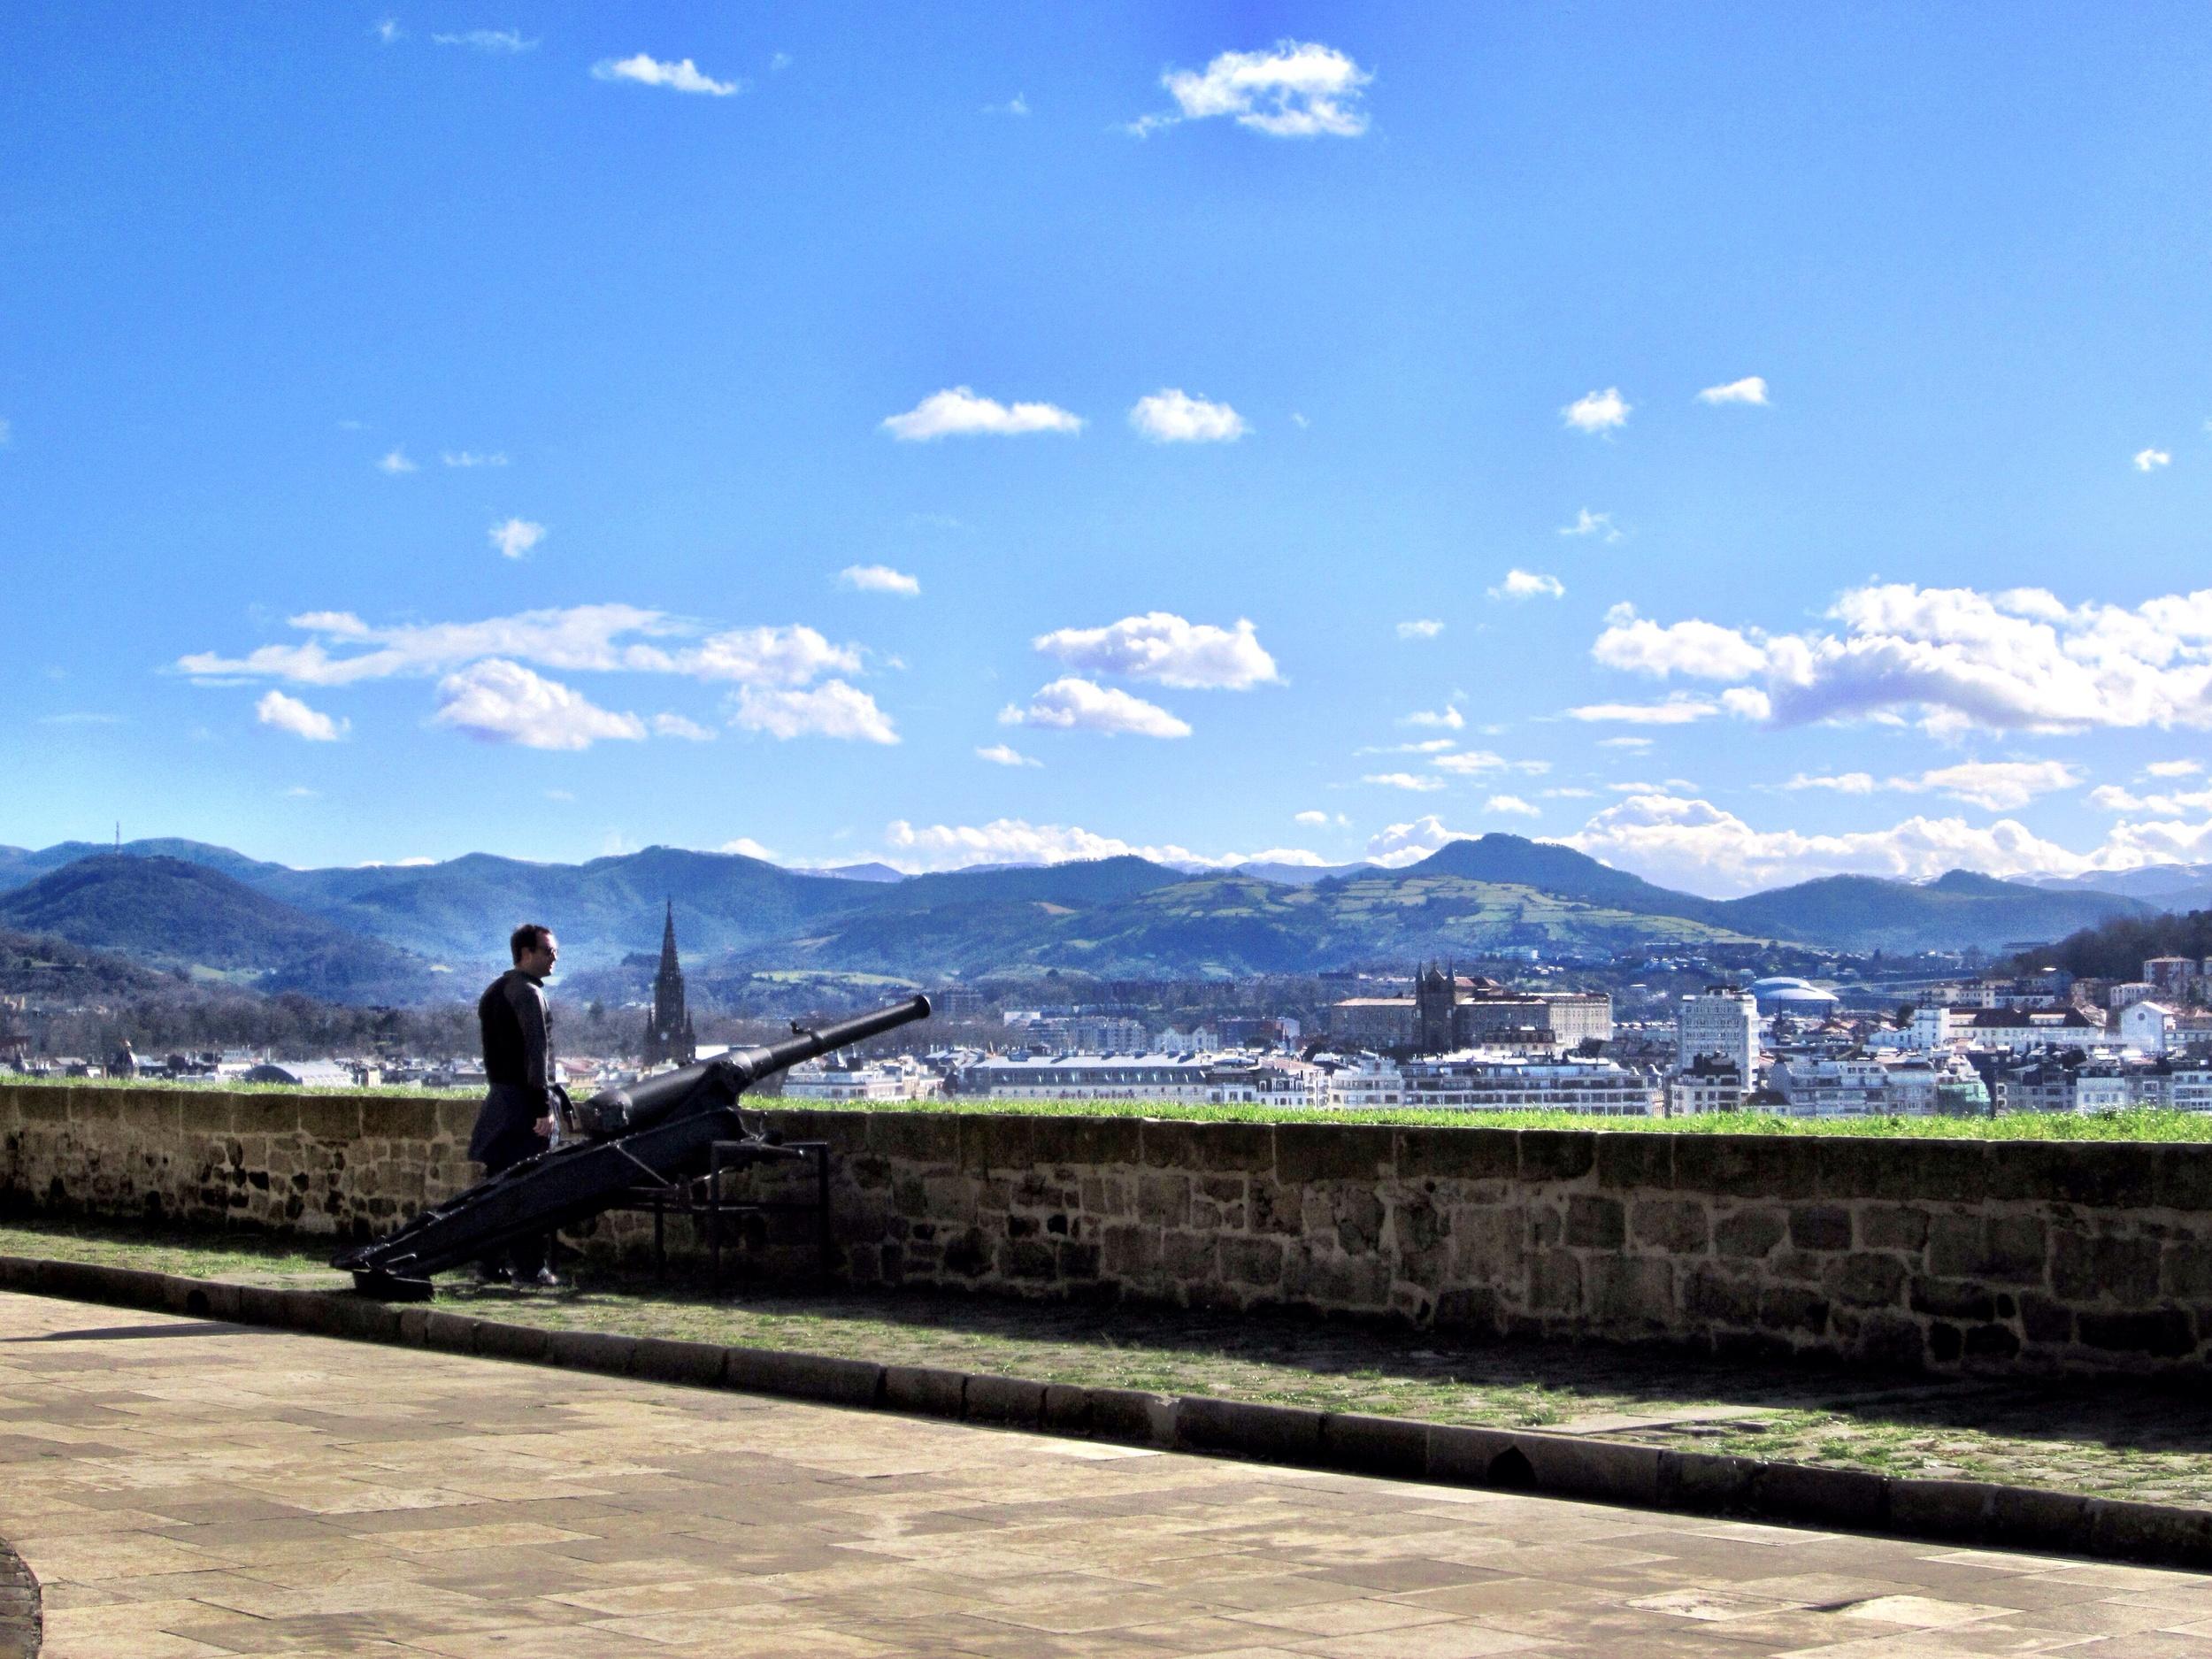 Billy overlooking the city of San Sebastián